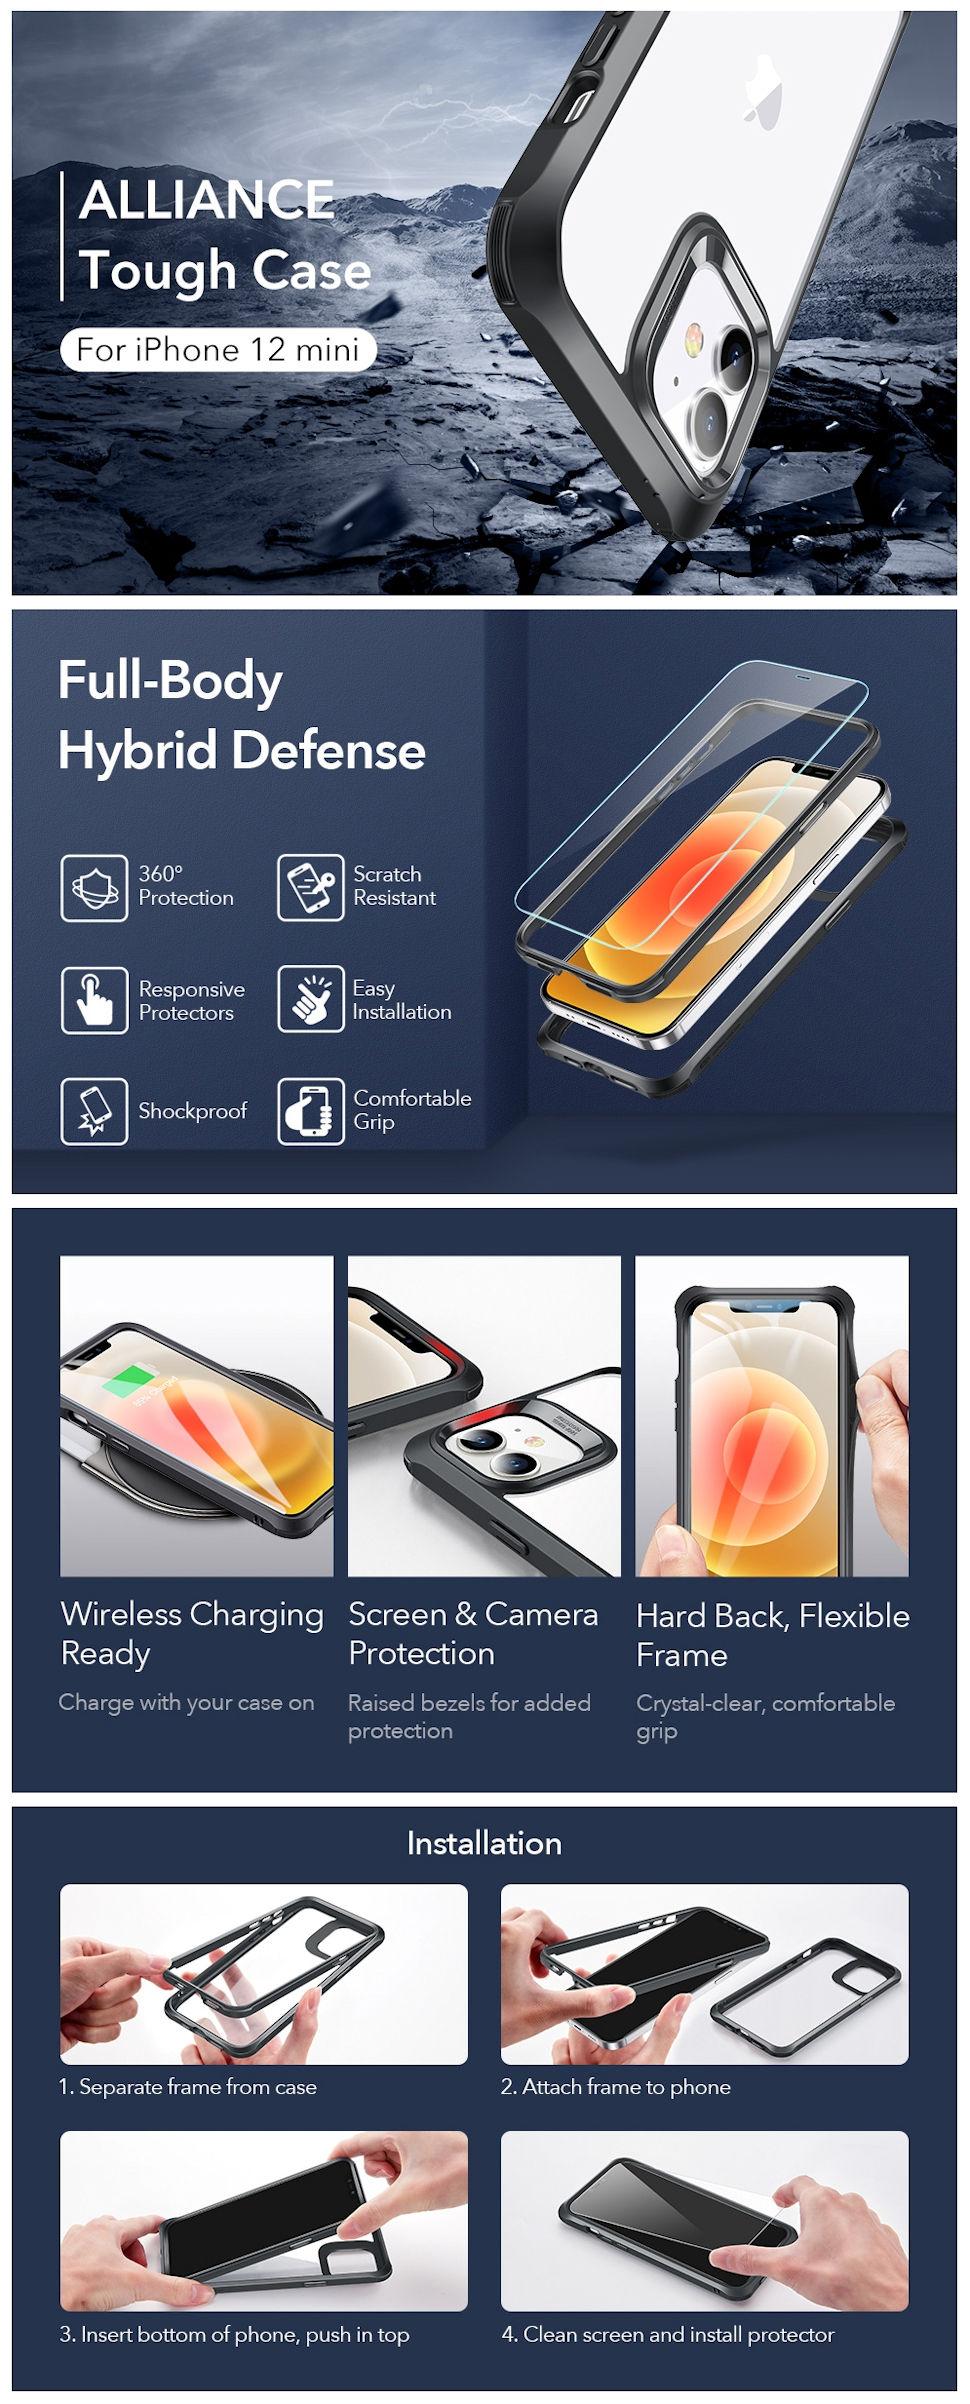 ESR Alliance - Black frame case for iPhone 12 mini + 2 Tempered-Glass Screen Protectors